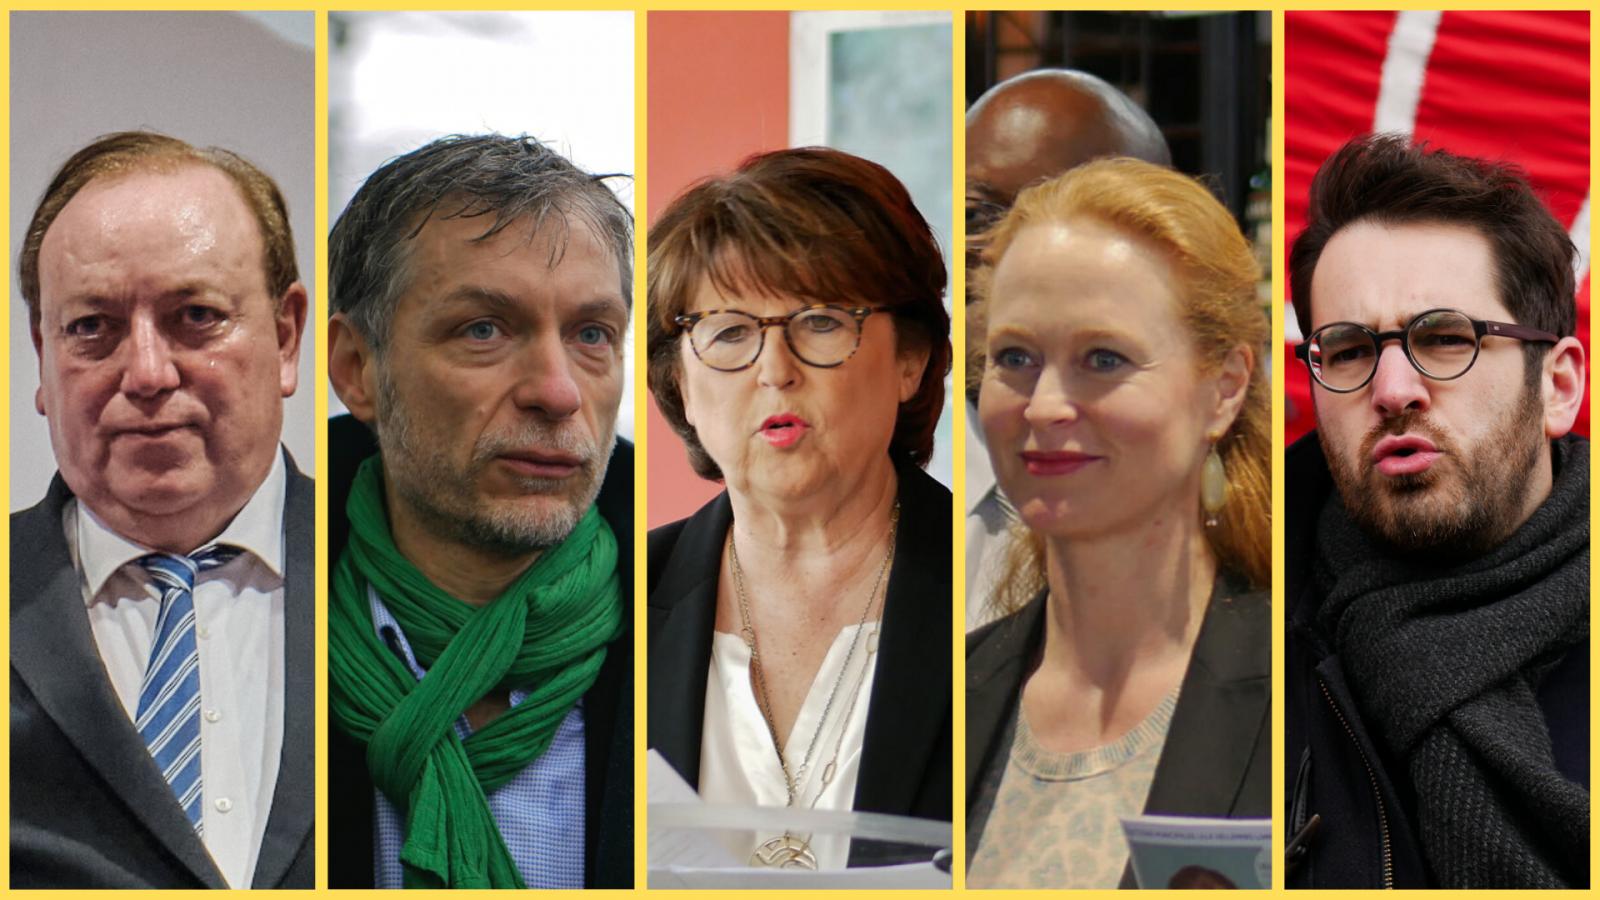 candidats débat municipales 2020 lille Spillebout poix Aubry Daubresse